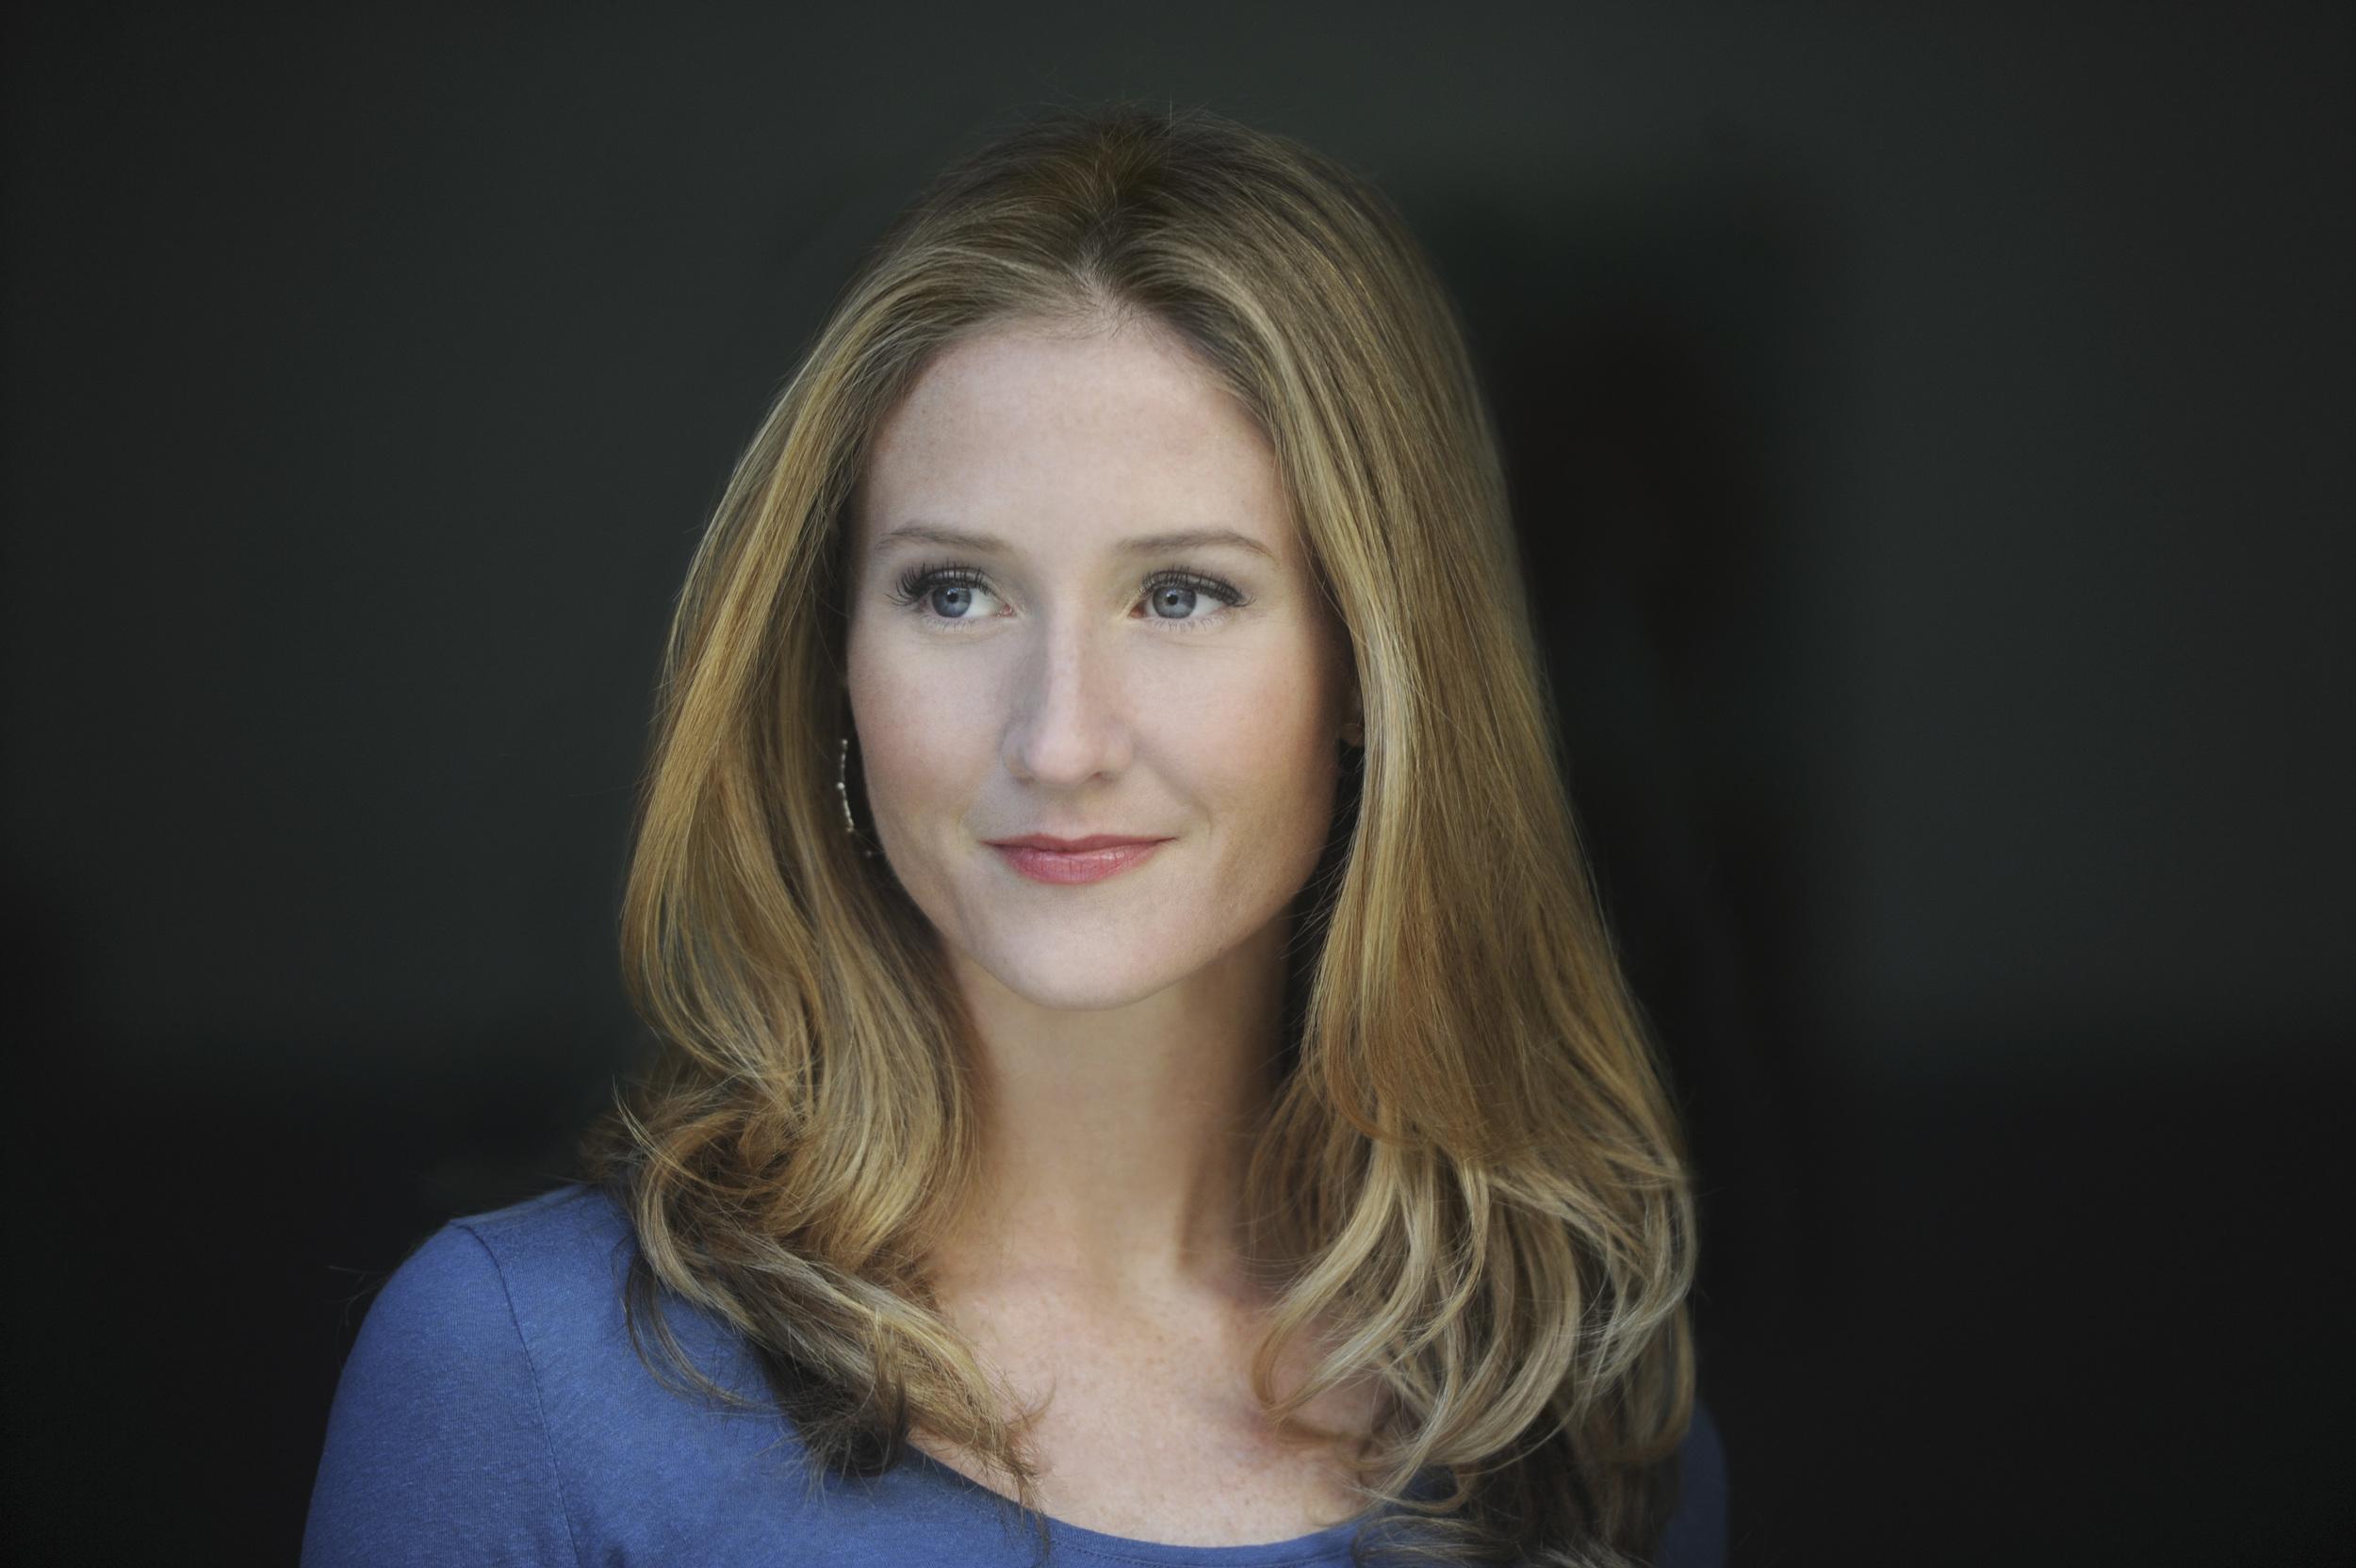 Pamela Ryckman , author of 'Stiletto Network'